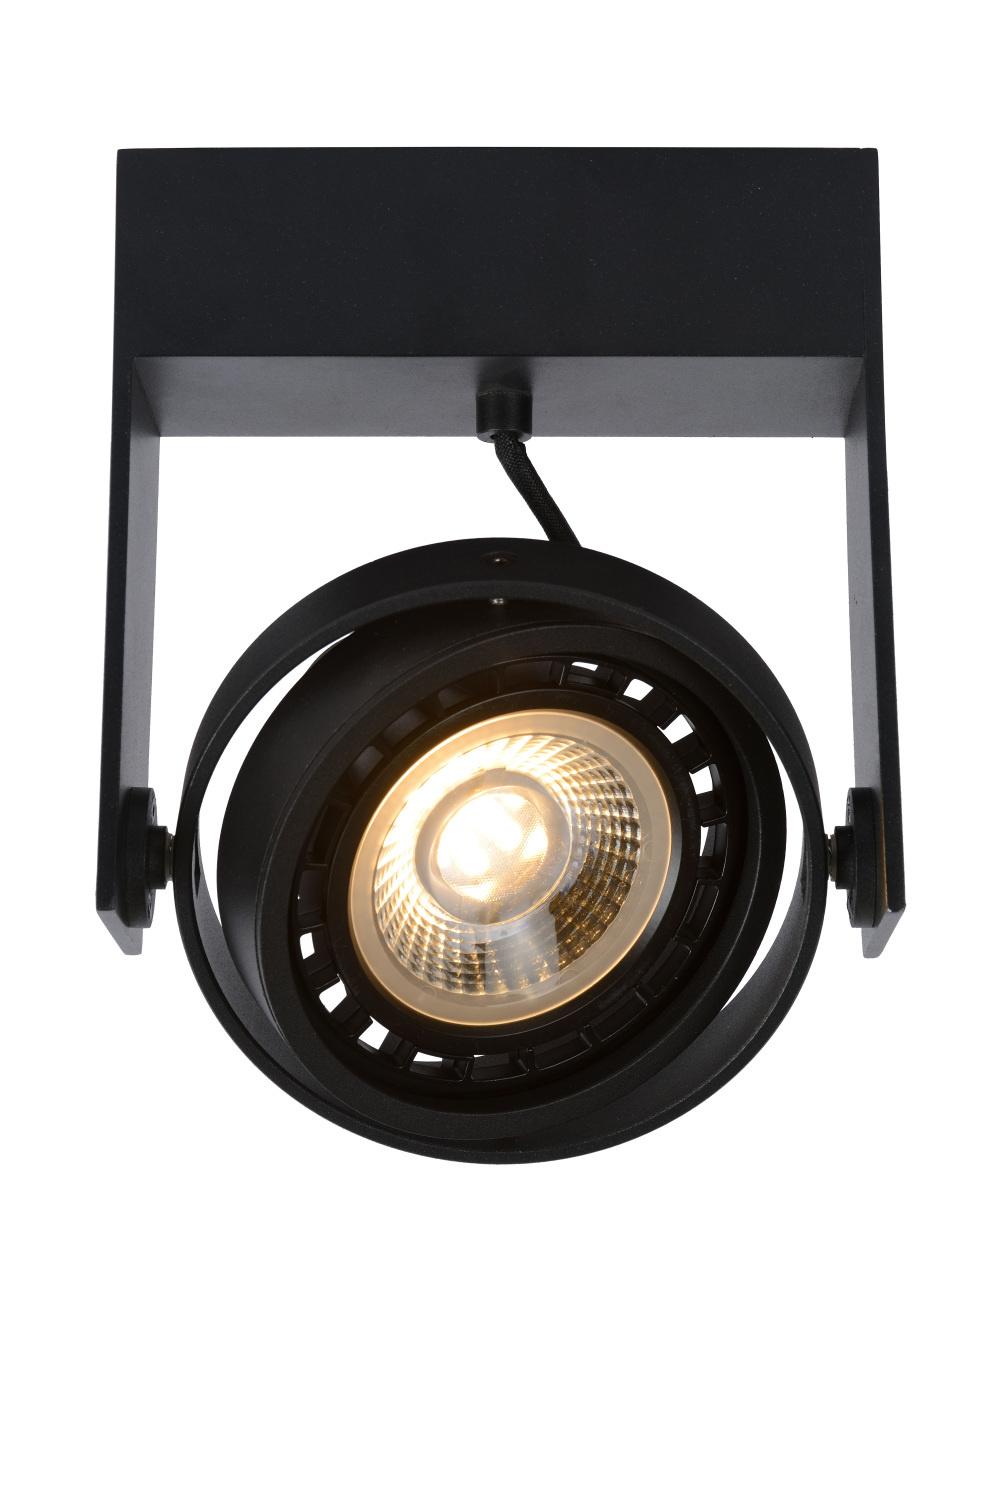 Lucide GRIFFON Plafondspot Dim-to-warm 1GU10 12W Zwart